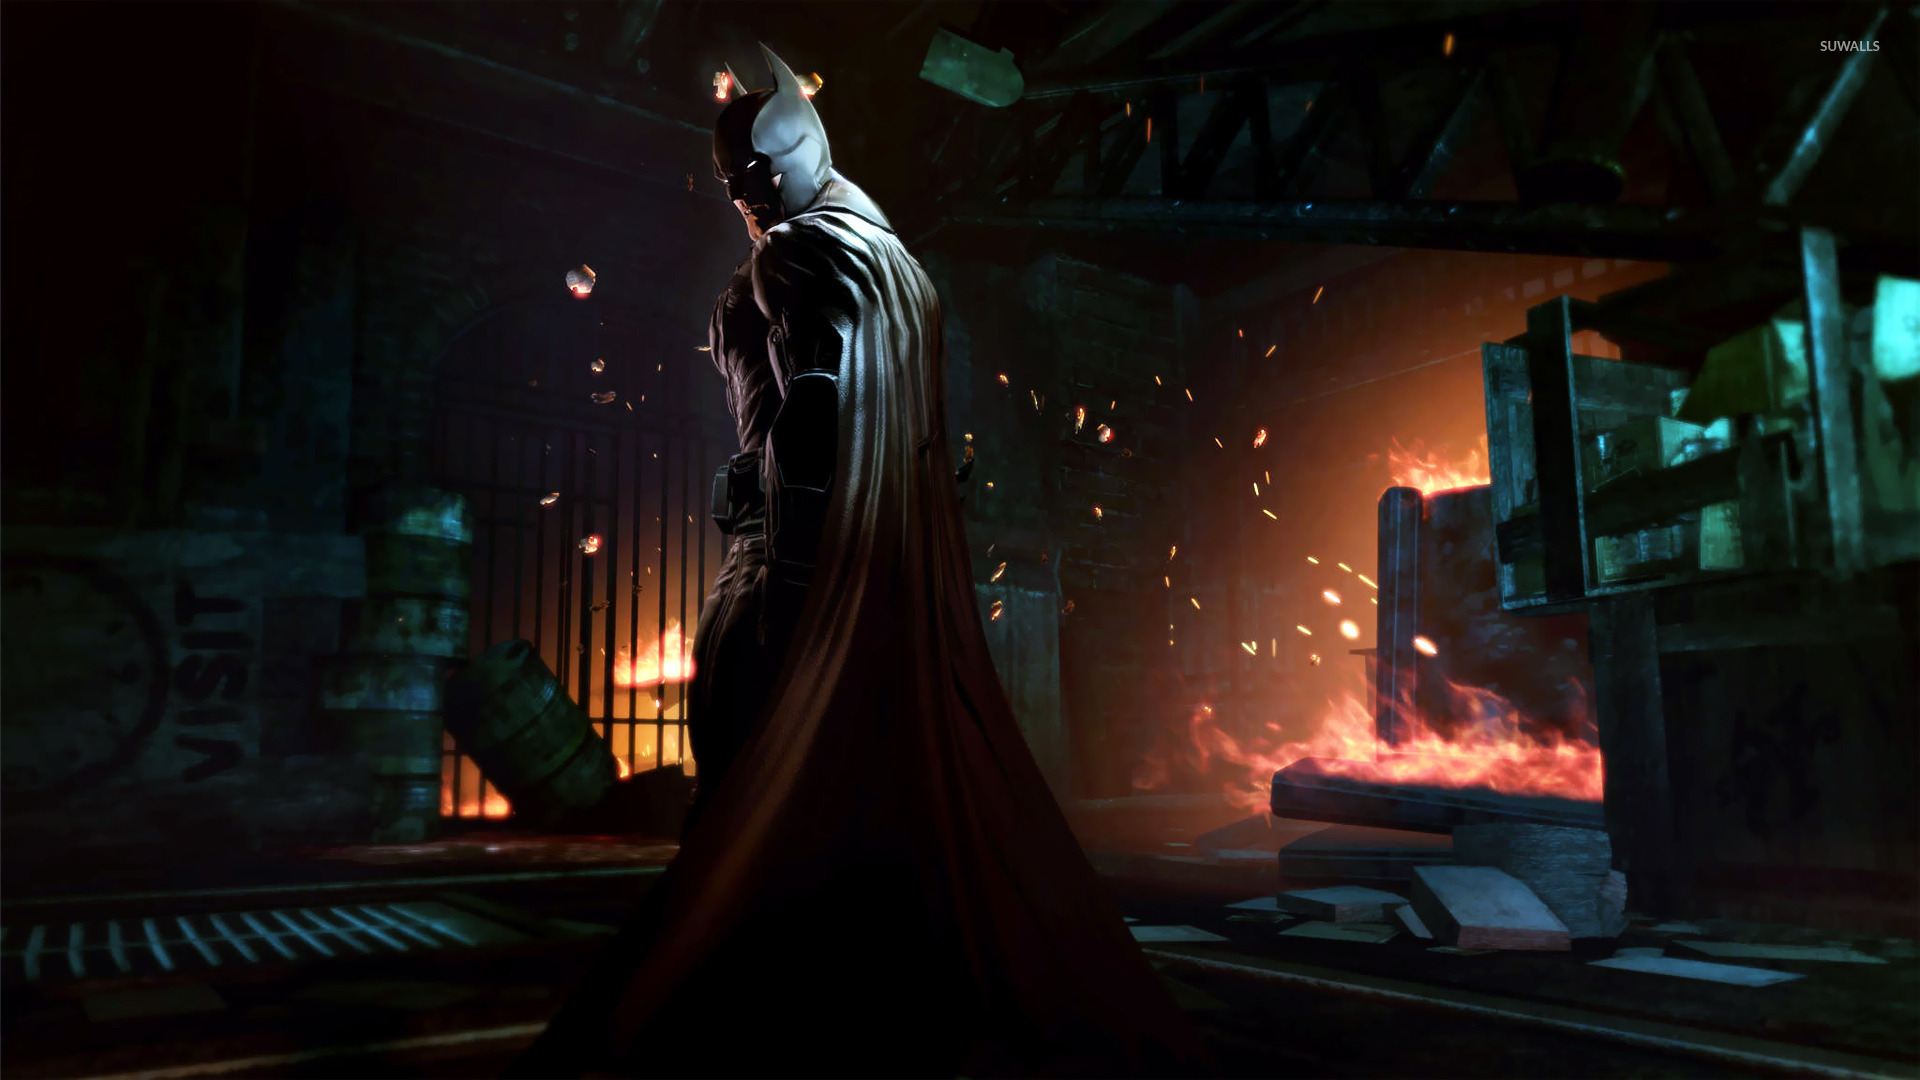 Batman Arkham Origins wallpaper   Game wallpapers   21228 1680x1050